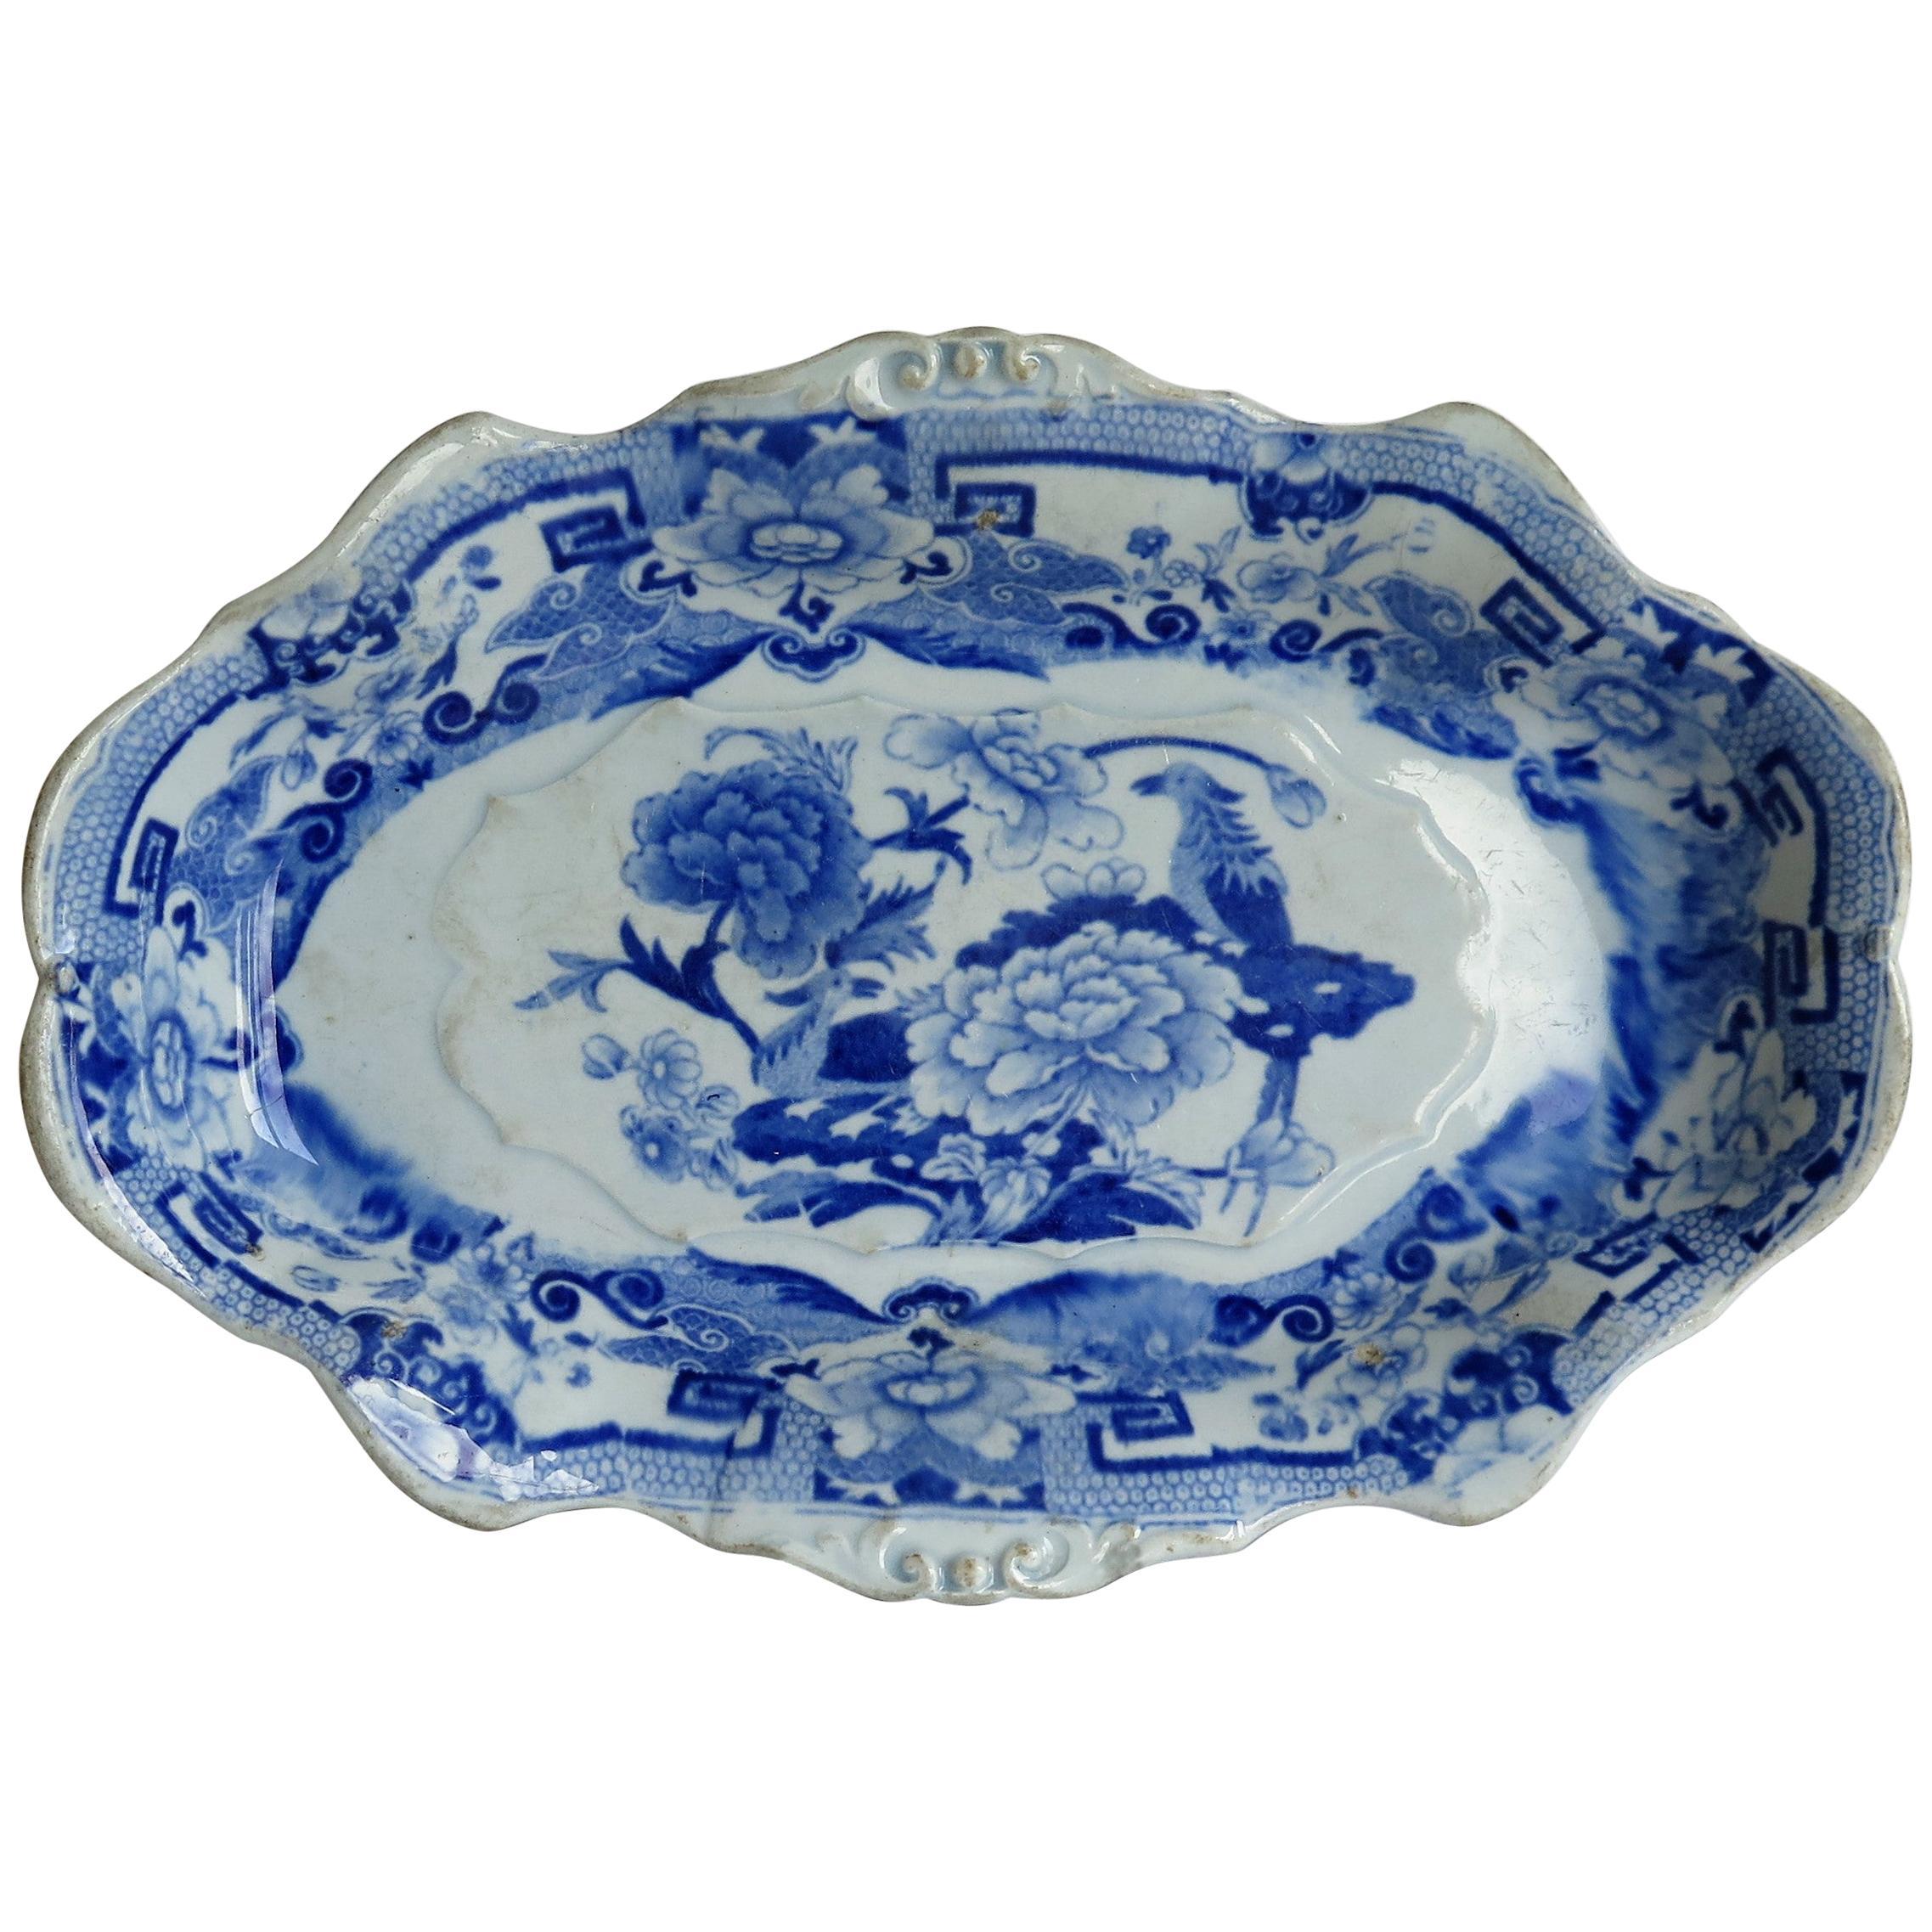 Mason's Ironstone Serving Dish Blue and White India Pheasants Pattern,circa 1820